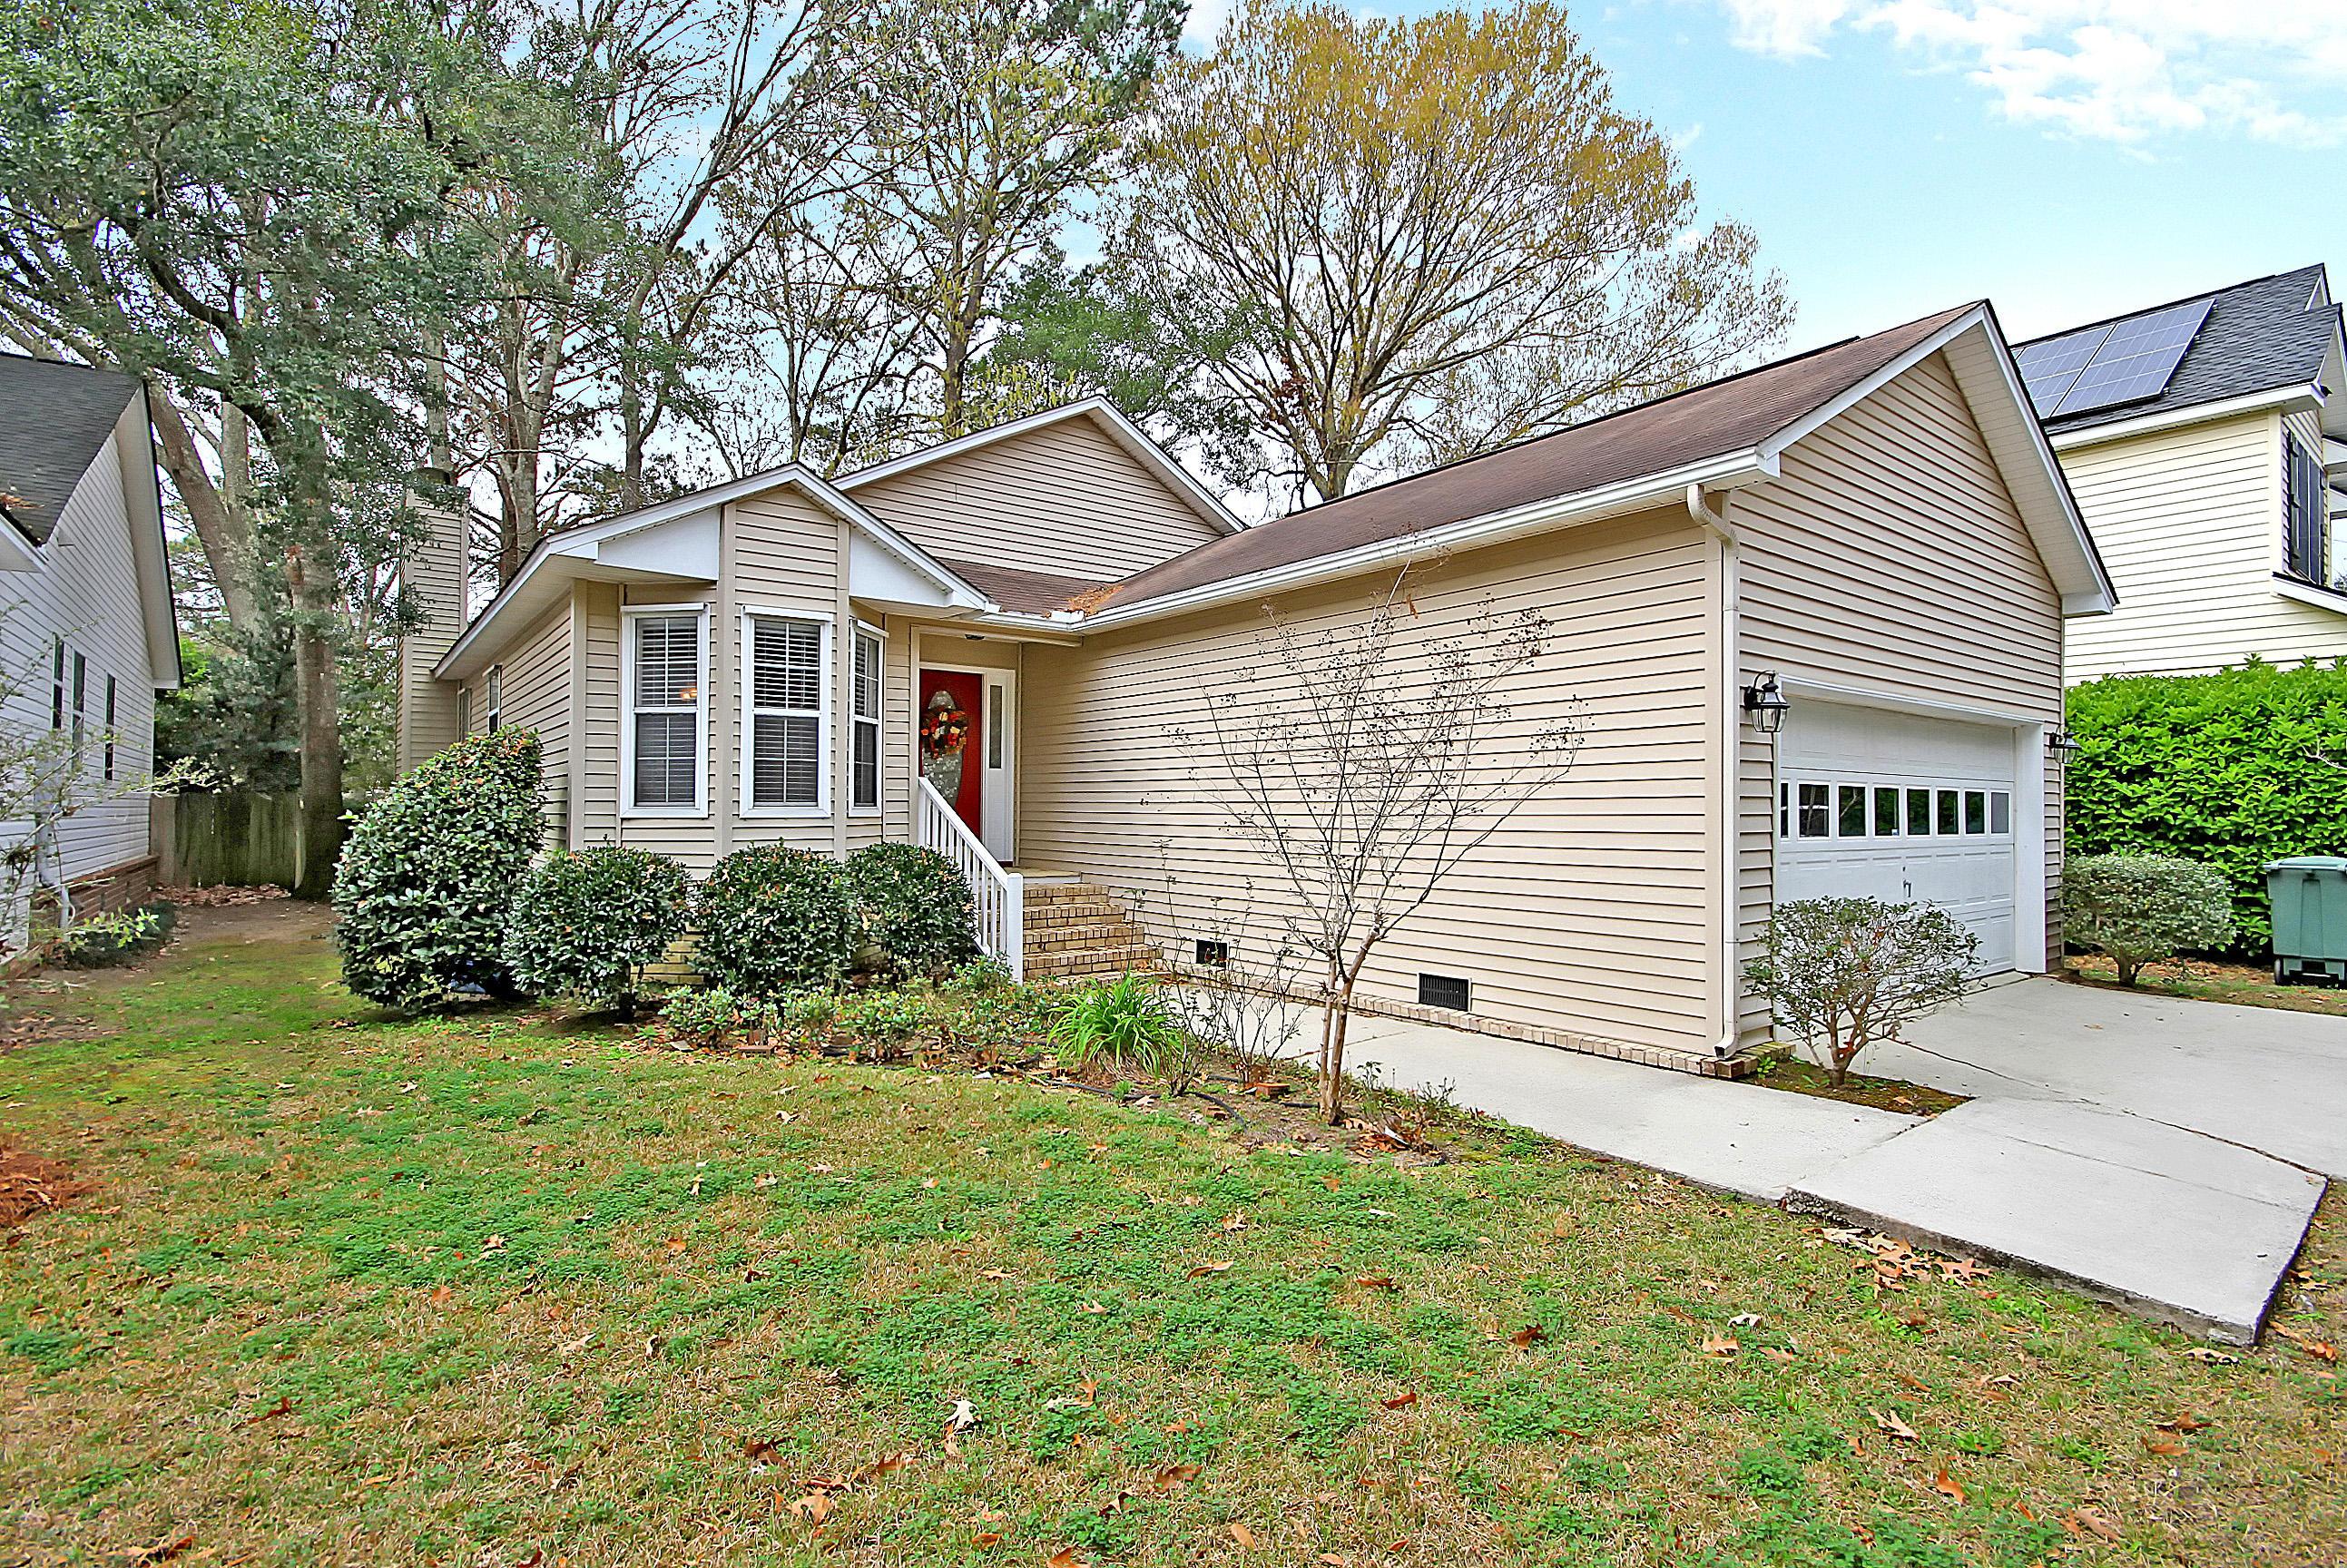 Harbor Place Homes For Sale - 845 Harbor Pl, Charleston, SC - 2